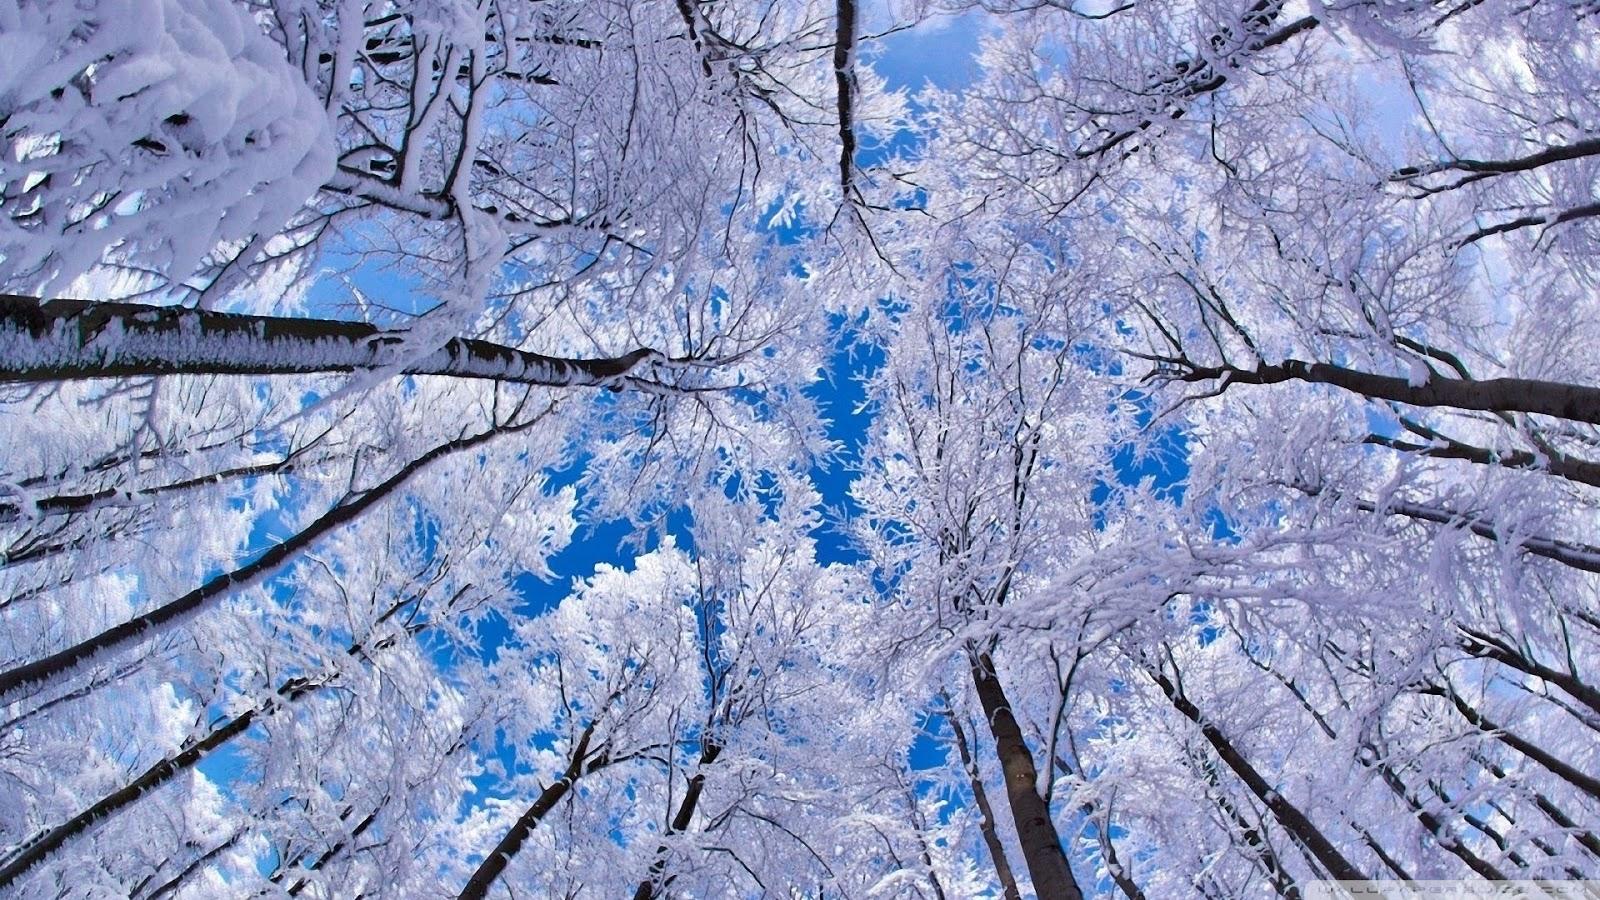 http://2.bp.blogspot.com/-fpp18dEuIAY/UPR0V2hybBI/AAAAAAAAG0o/-8Y7C8Ze7ls/s1600/neige_arbre+hiver.jpg